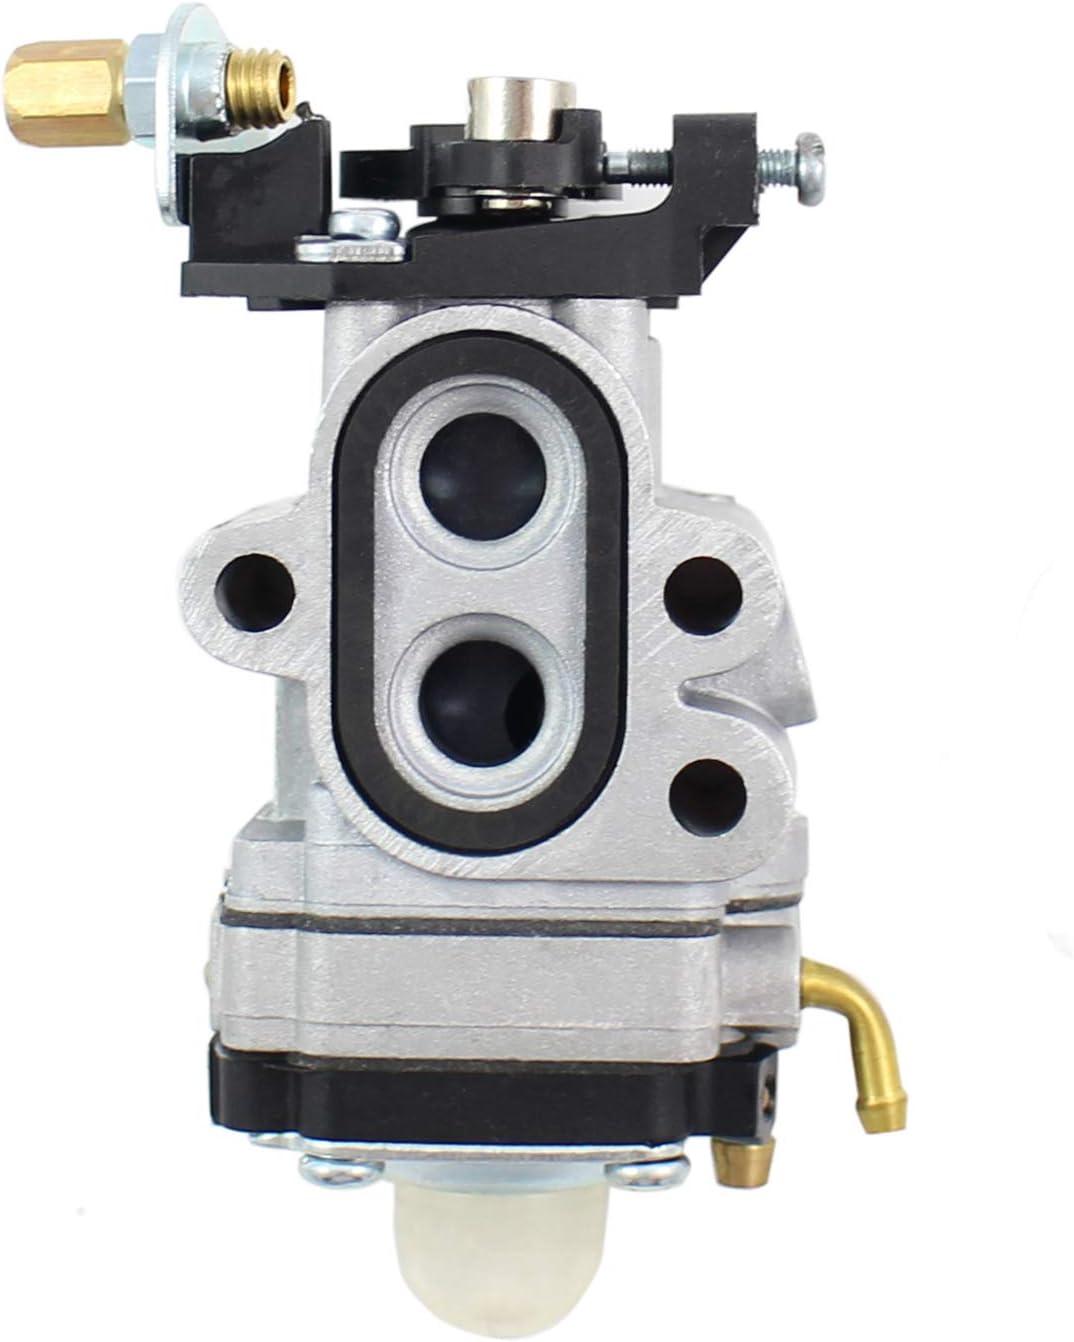 RedMax BCZ260TS 967194302 BCZ2660TS Brushcutter carburetor carb part 502238401